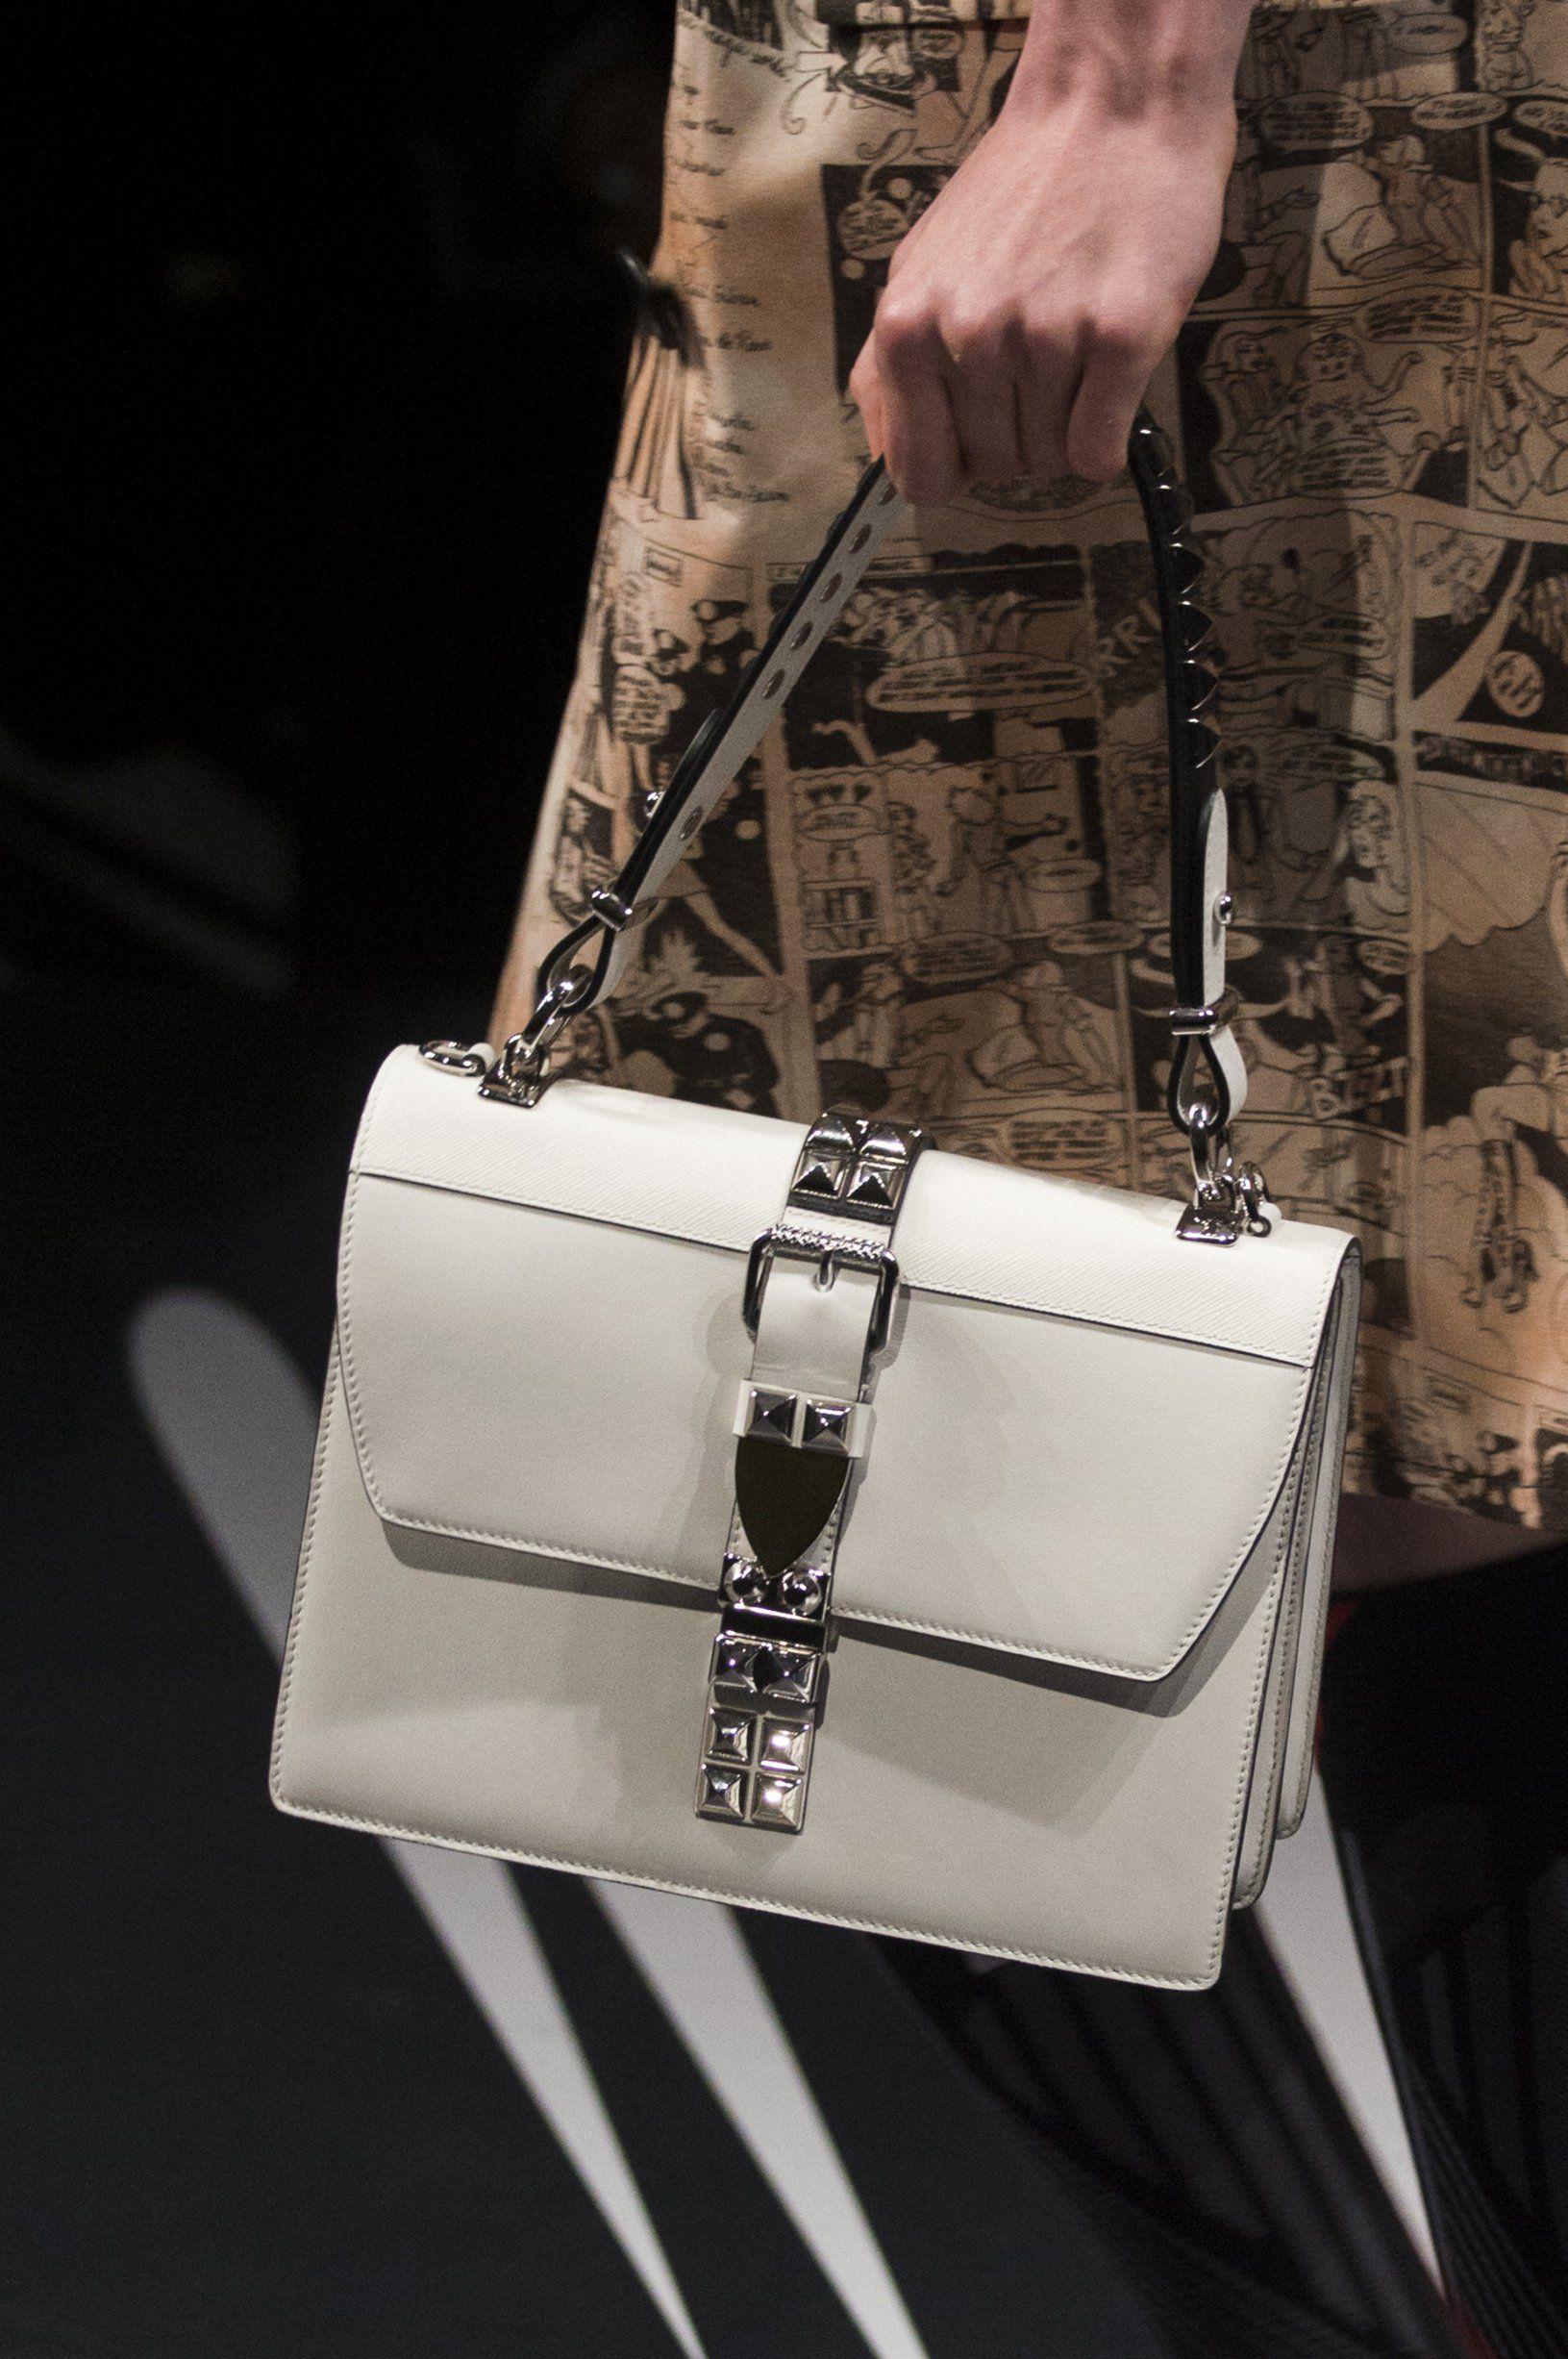 c7ecbcd2b8 Sac printemps-été 2018: le sac blanc Prada Sac Prada, Sac Tendance,